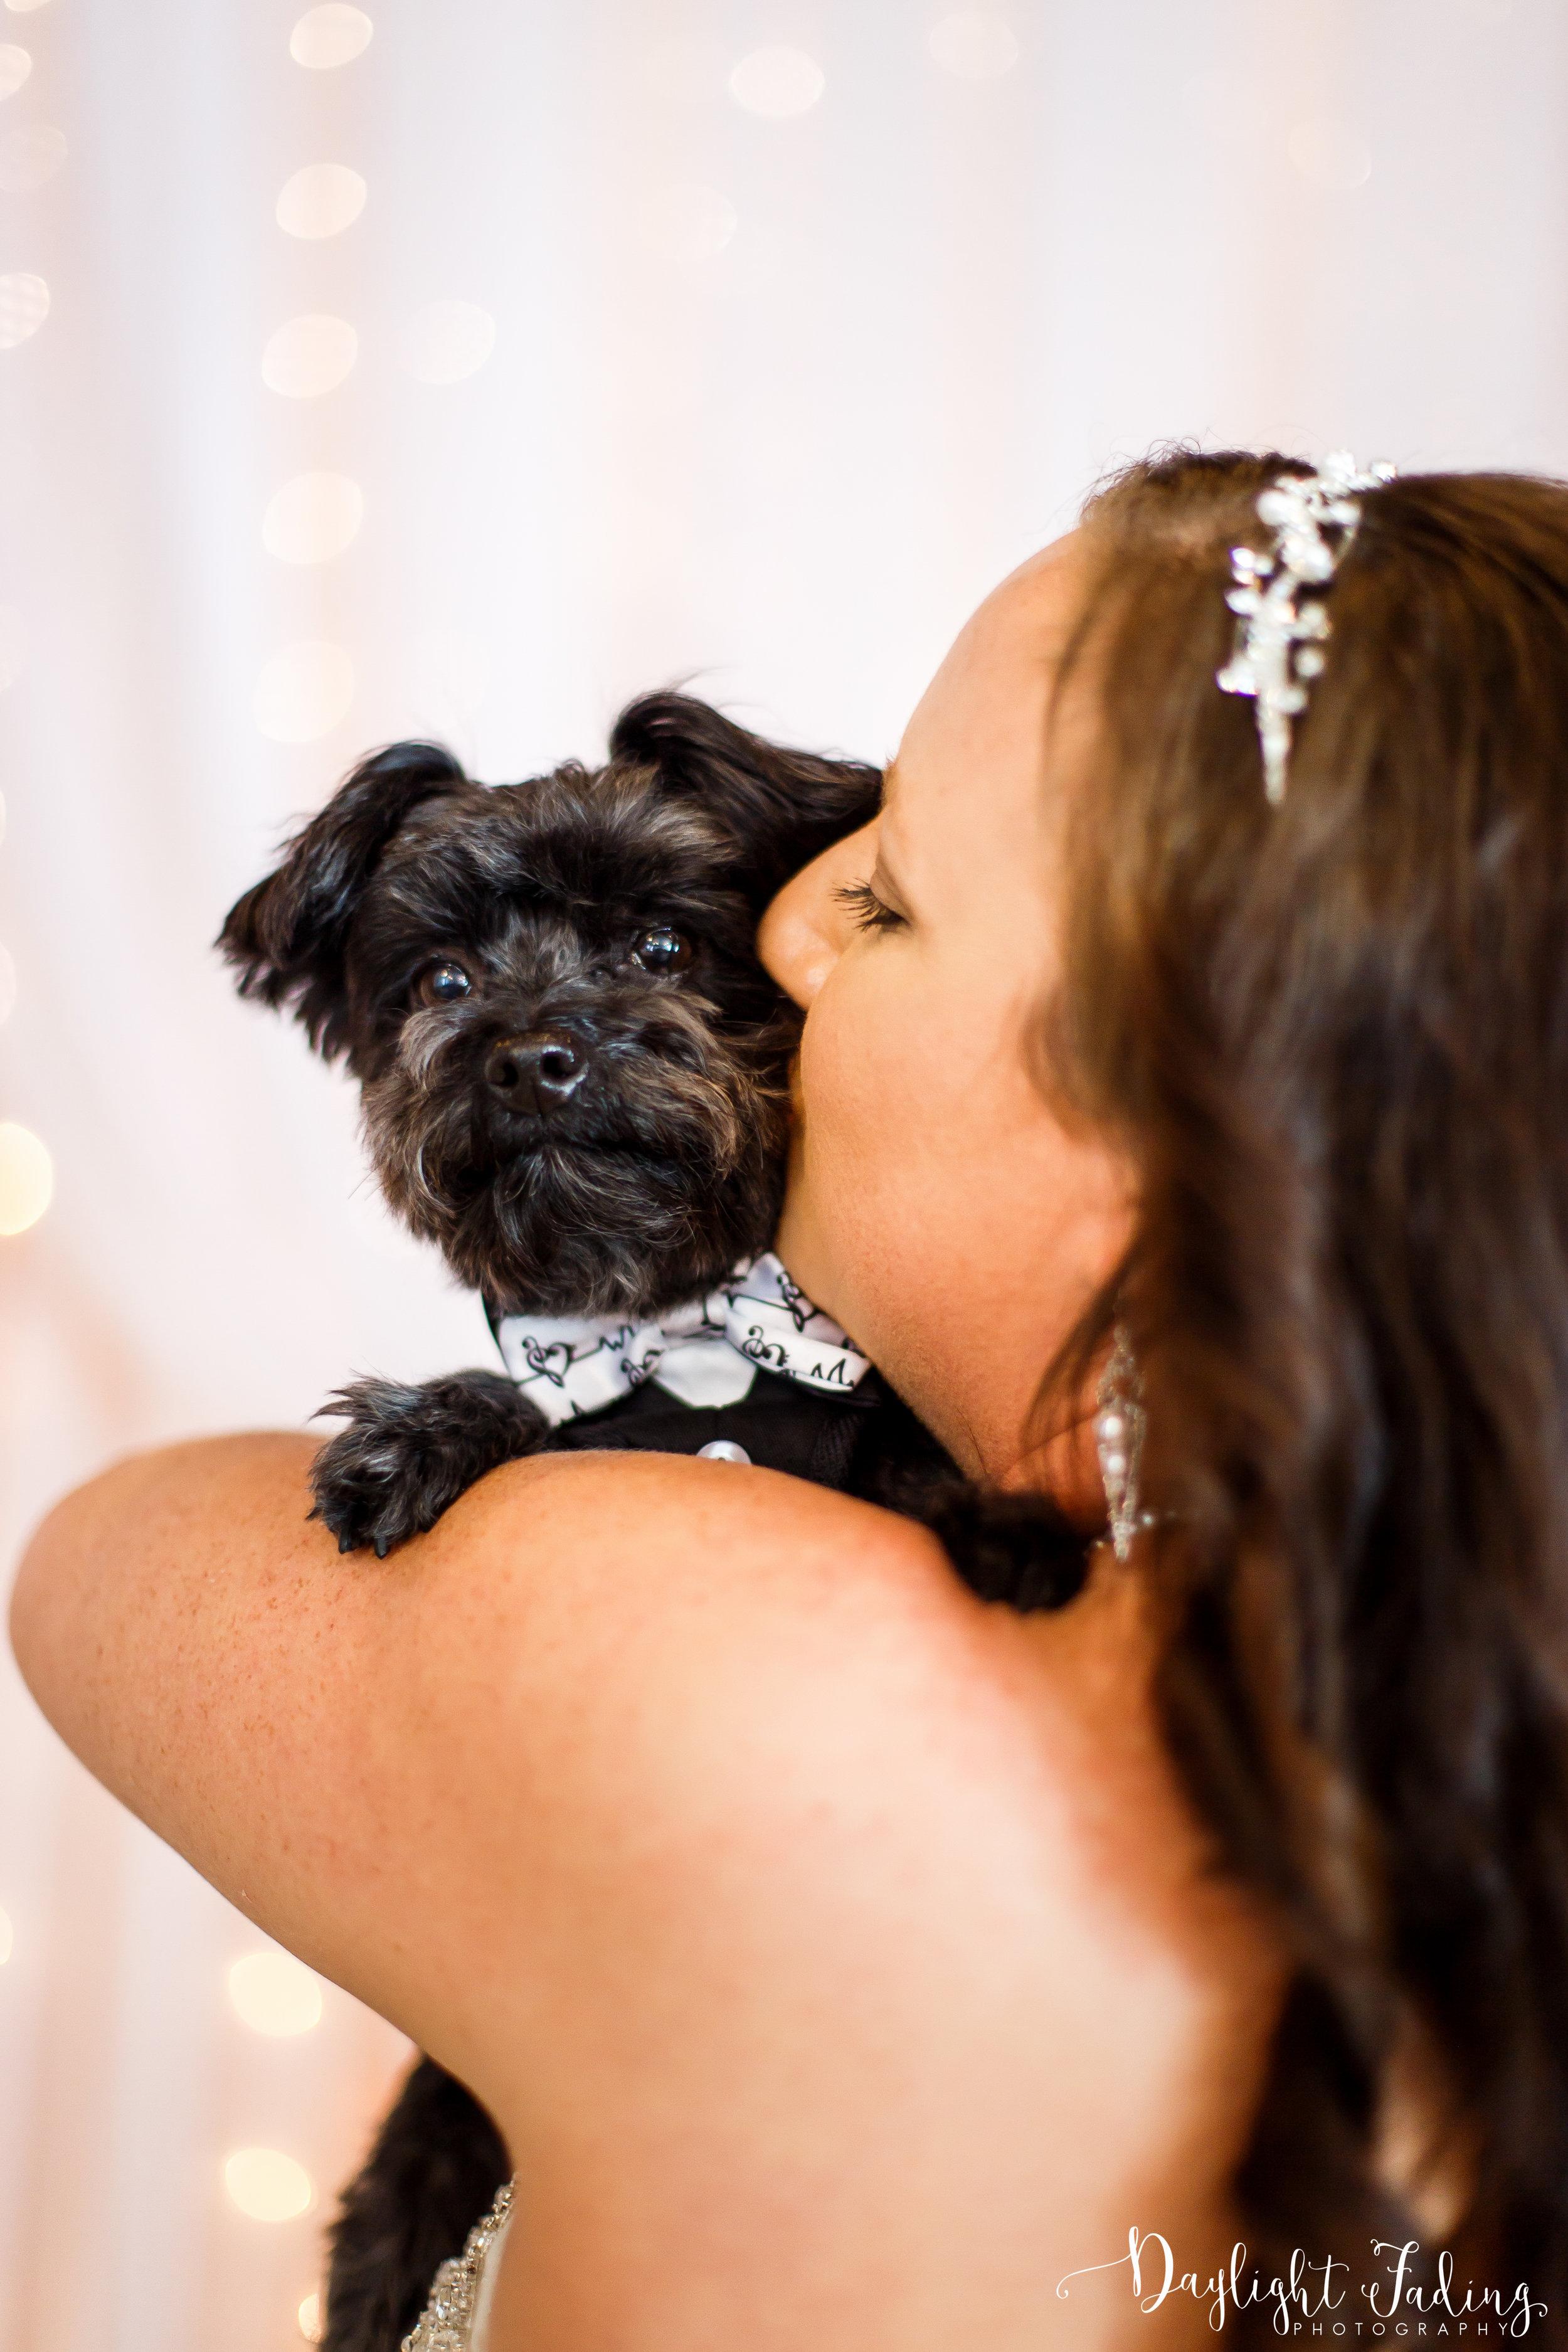 Bride and Dog Ring Bearer in Benton Louisiana Wedding Photographer - daylightfadingphotography.com